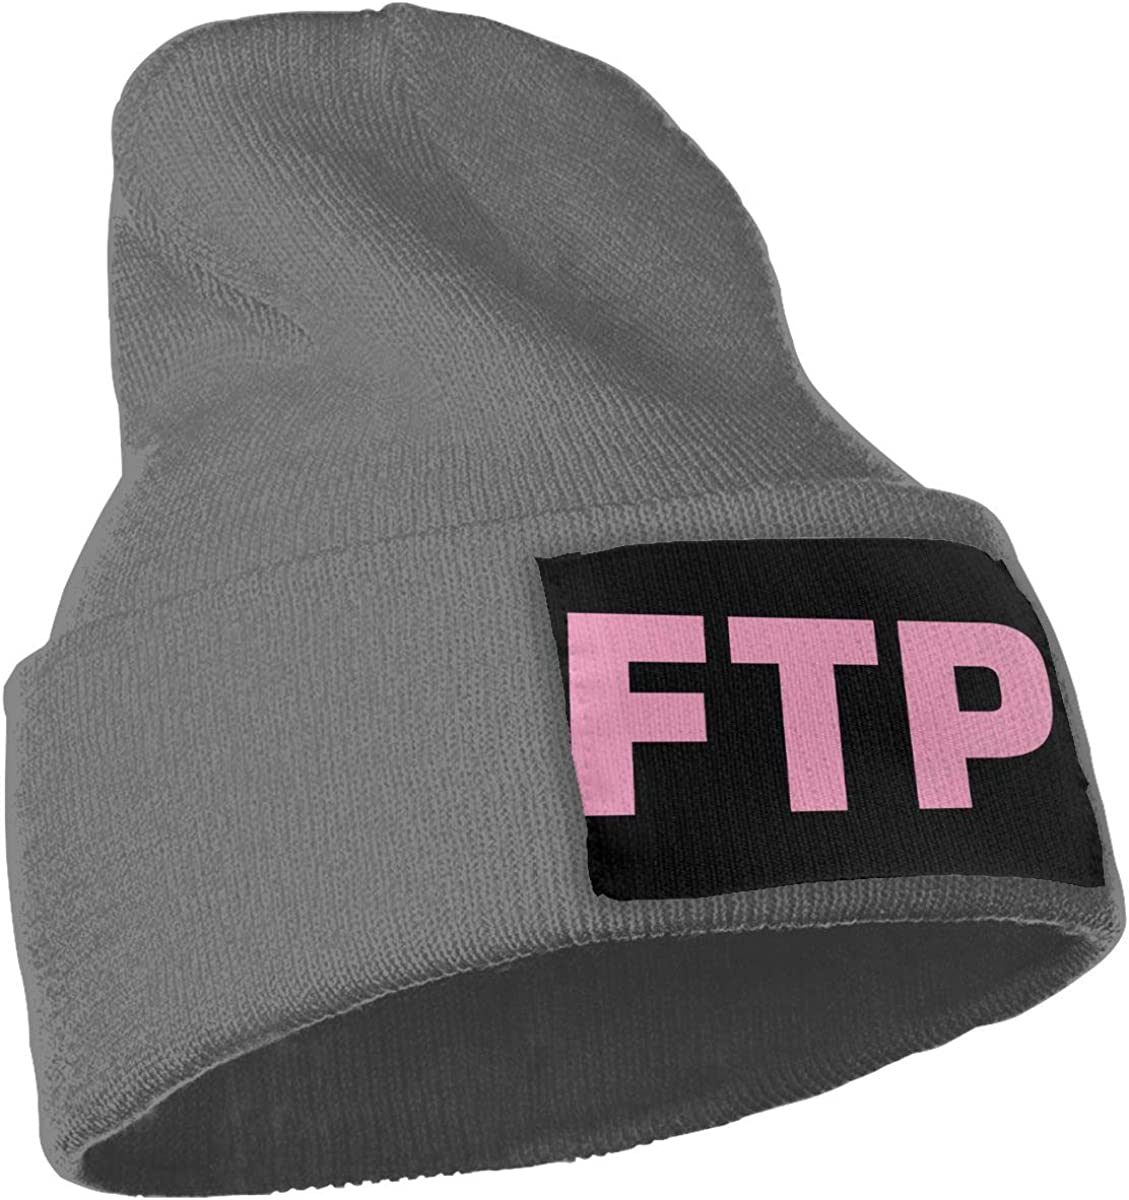 XccX Suicide Boys Custom Beanie Hat Unisex Adult Uicideboy Knitted Fashion Design Hat Winter Warm Knit Ski Skull Cap